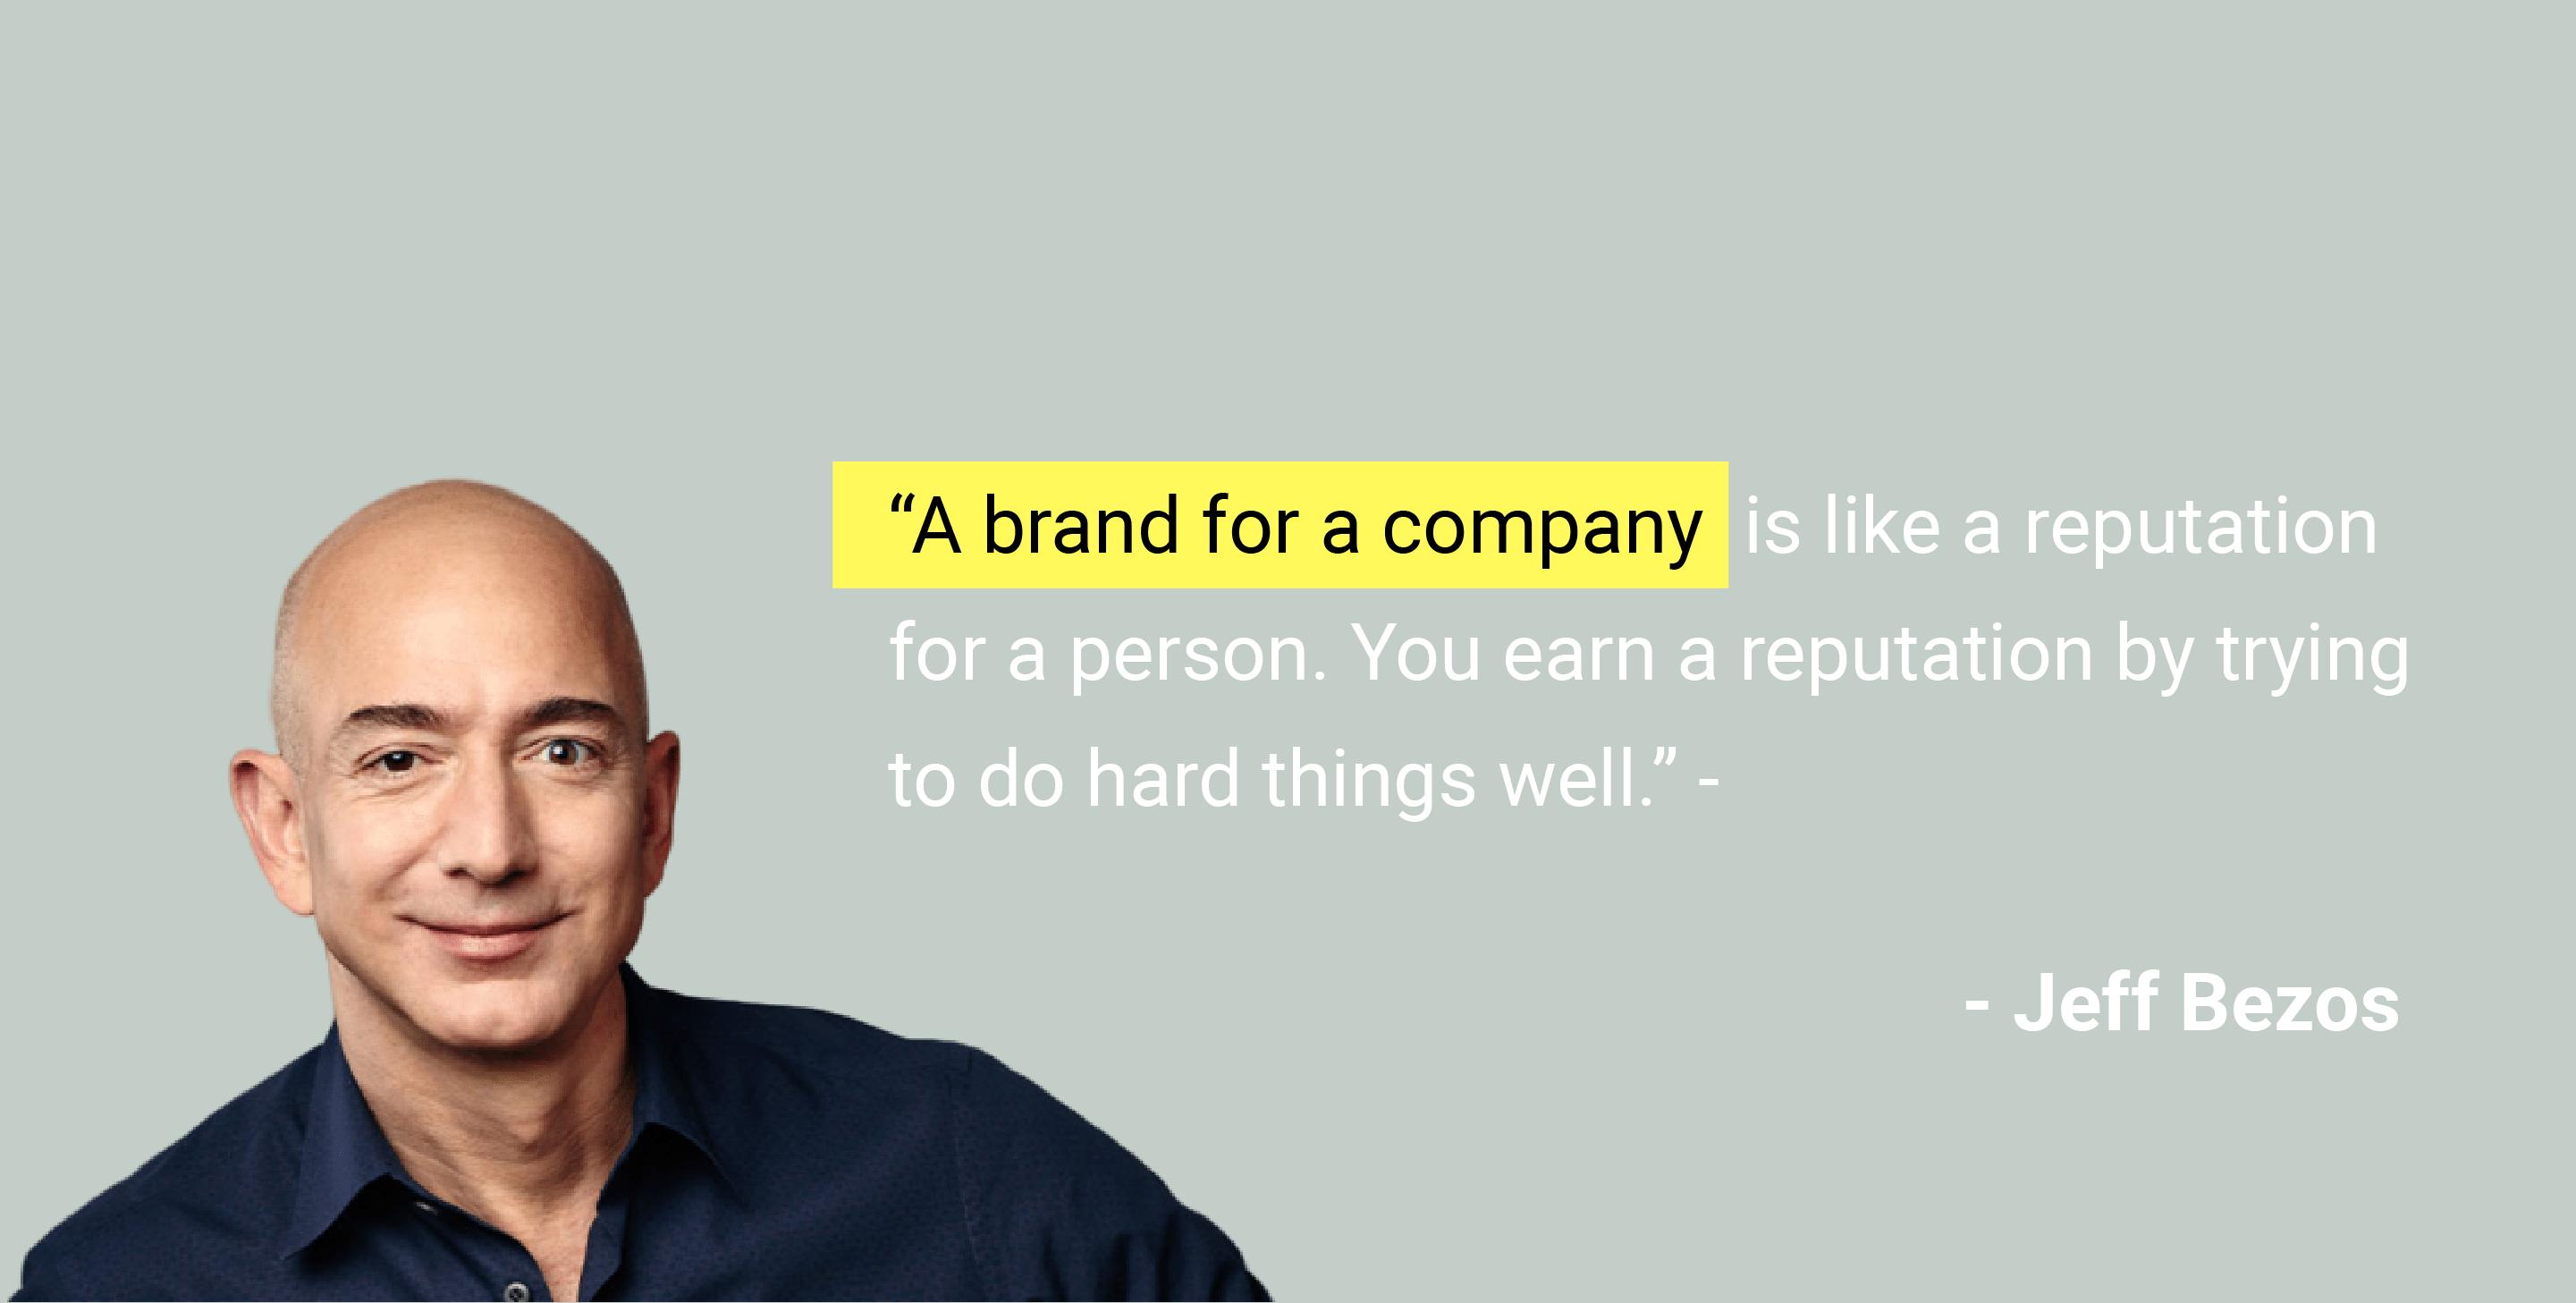 Quote by Jeff Bezos on Brand Development Strategies.